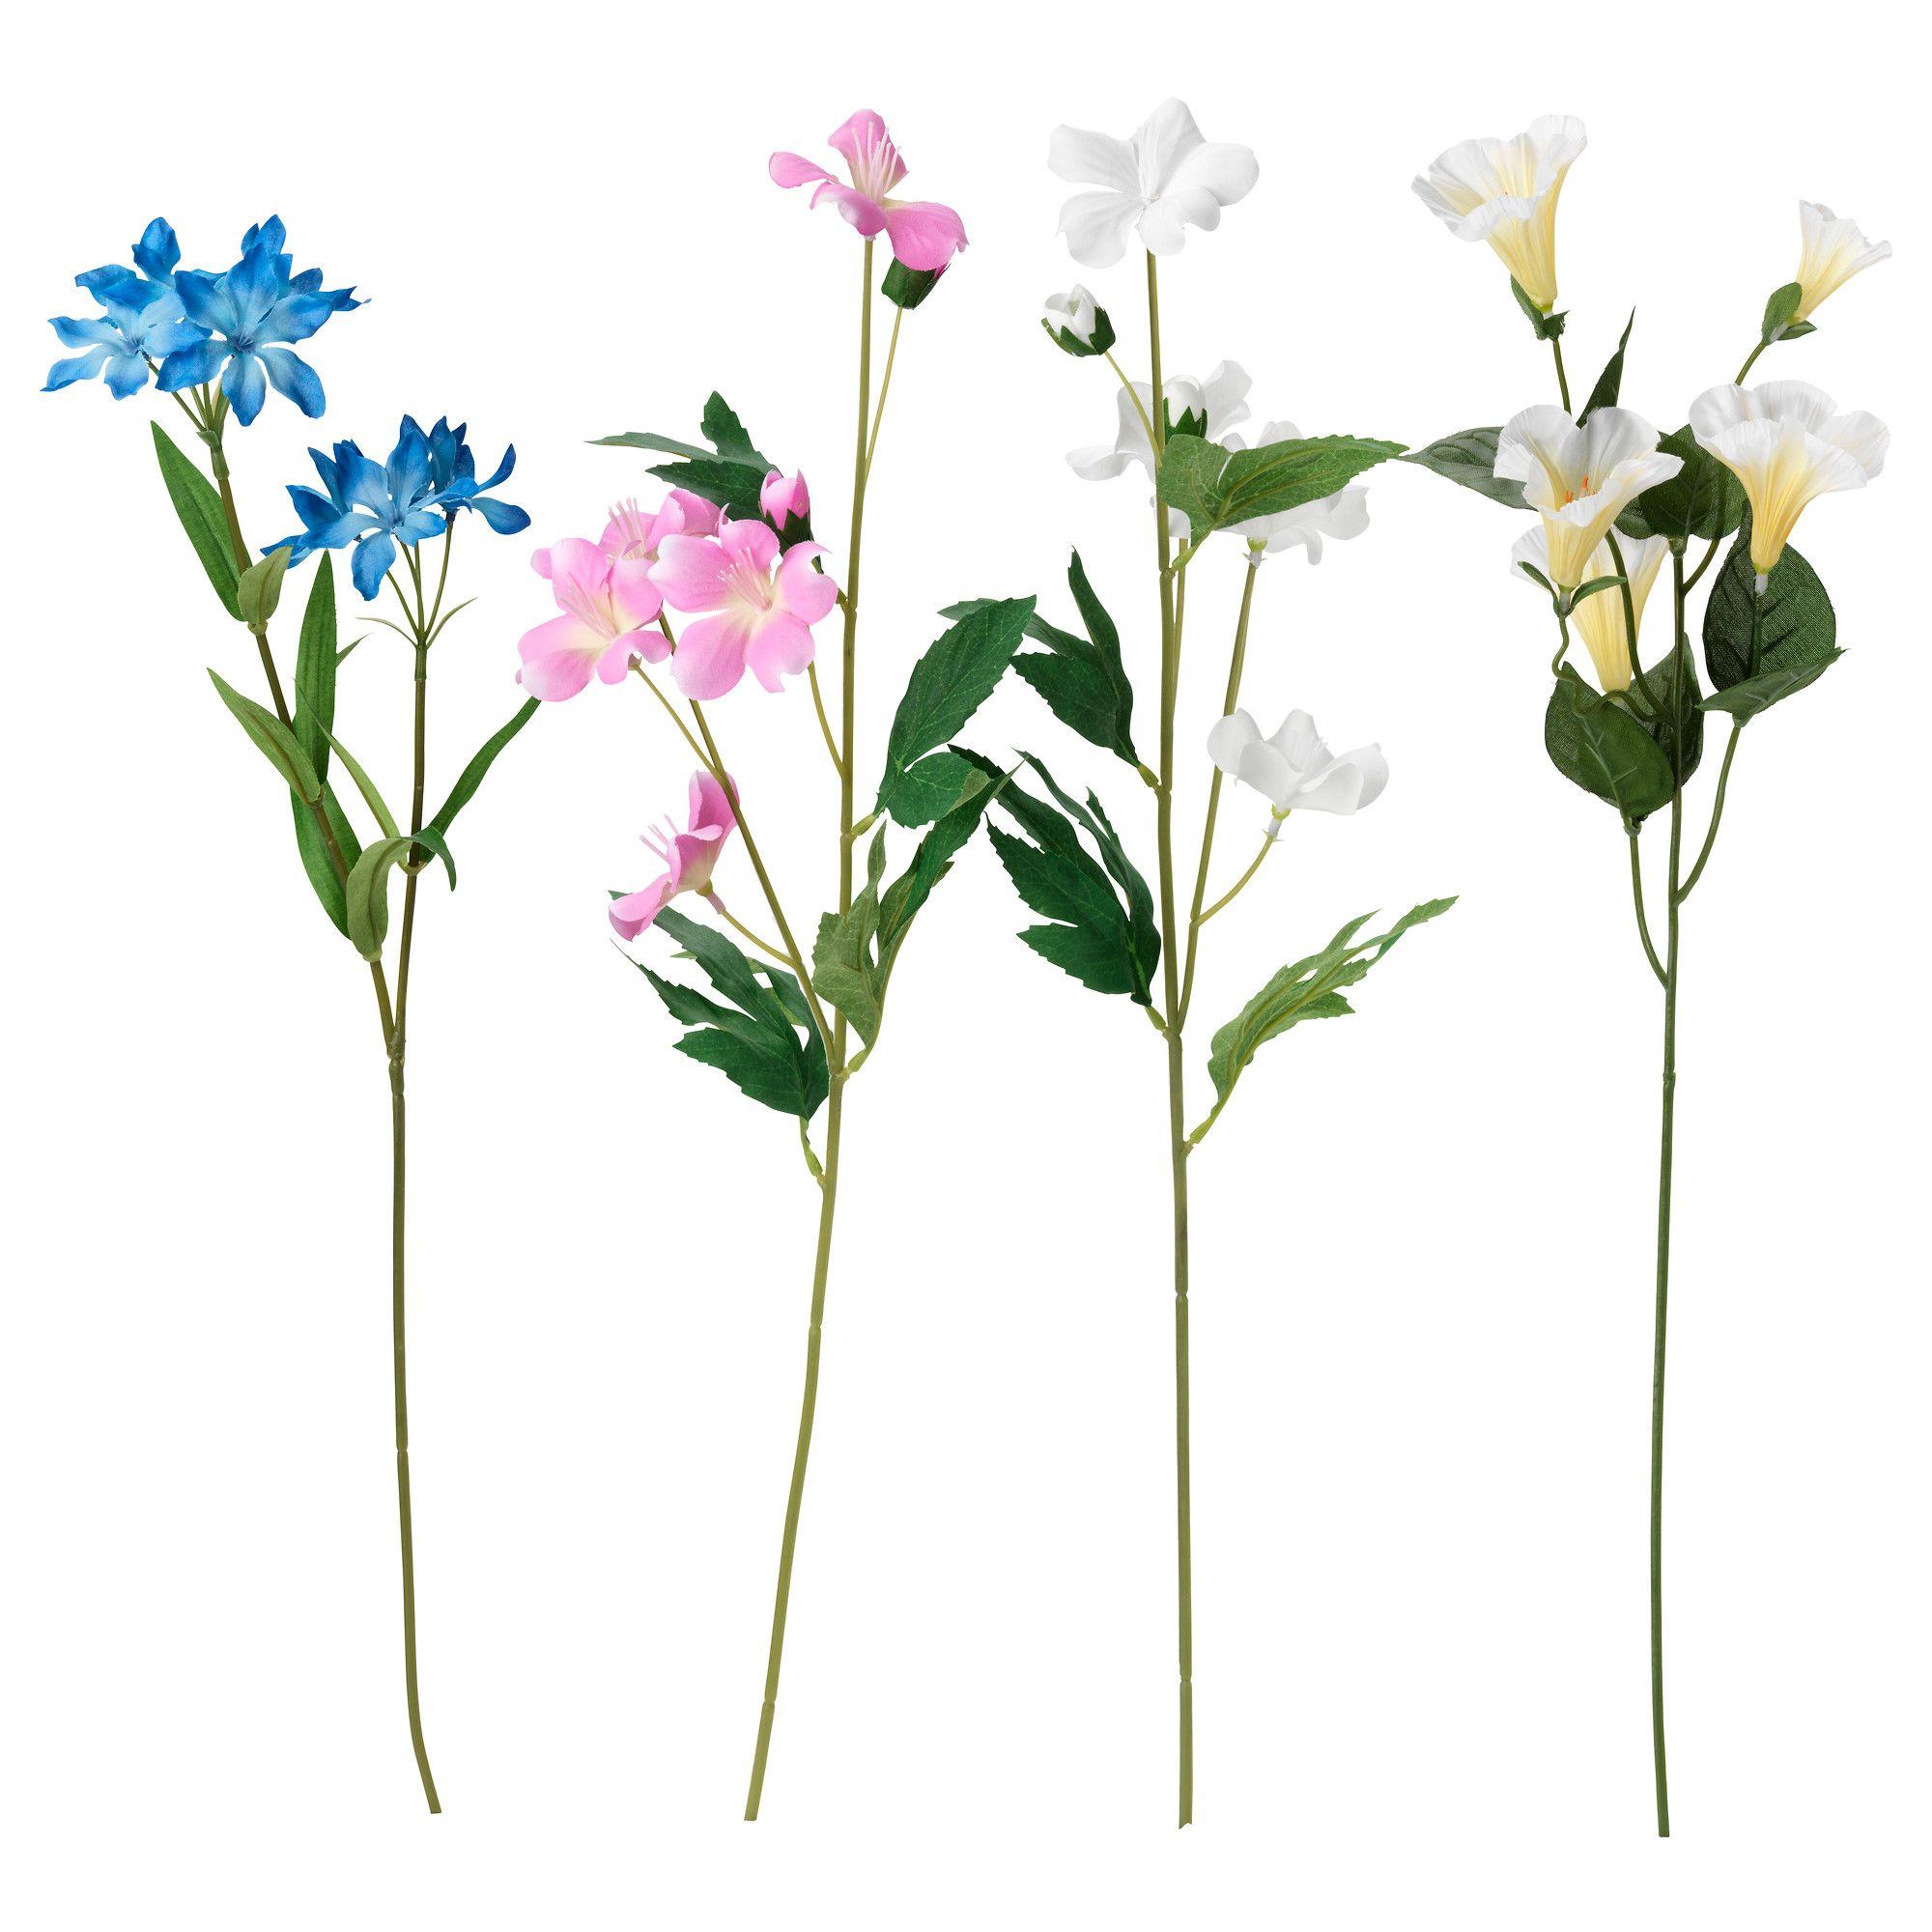 smycka fleur artificielle ikea fringue pinterest fleurs artificielles artificiel et ikea. Black Bedroom Furniture Sets. Home Design Ideas